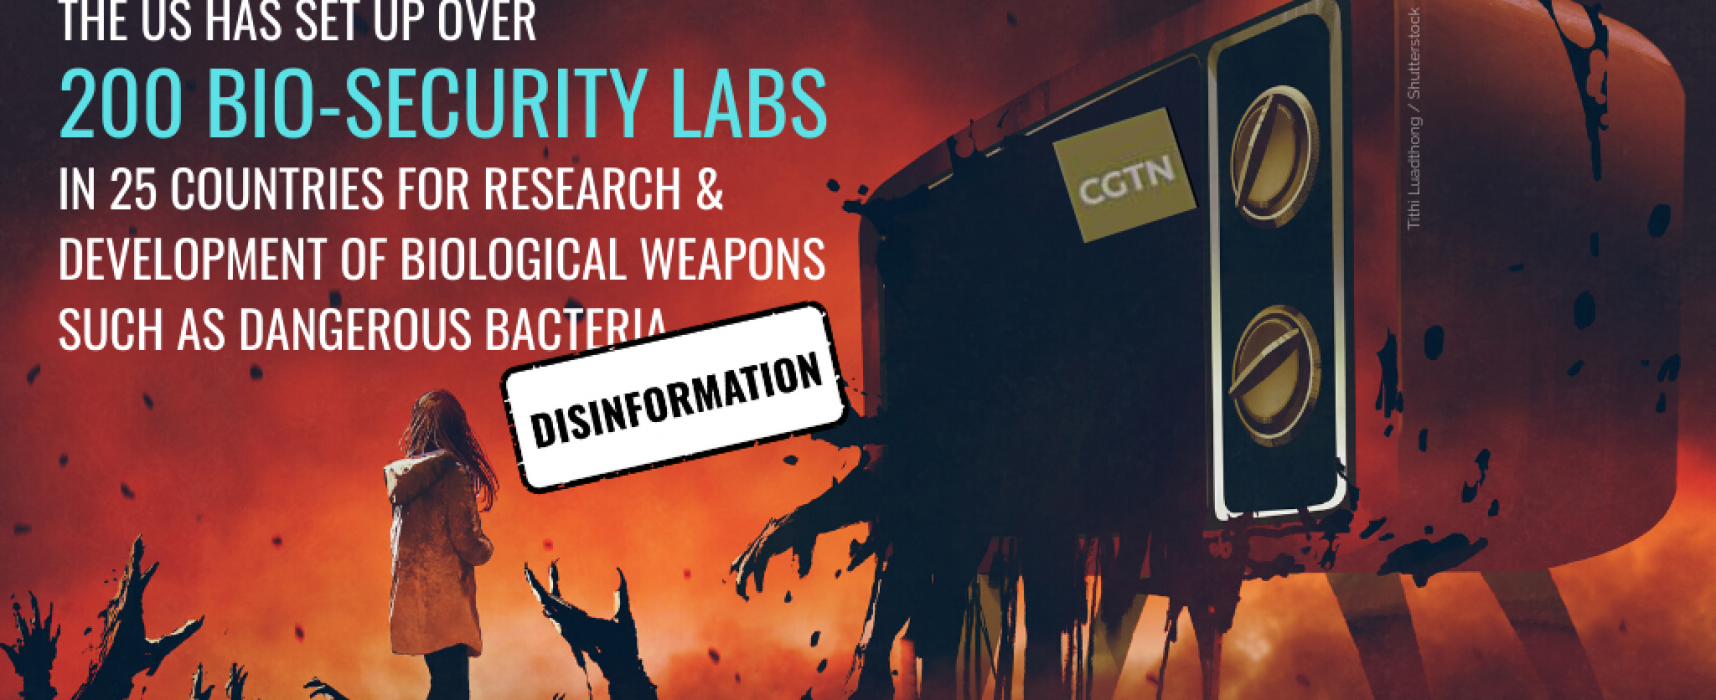 The secret labs conspiracy: a converging narrative